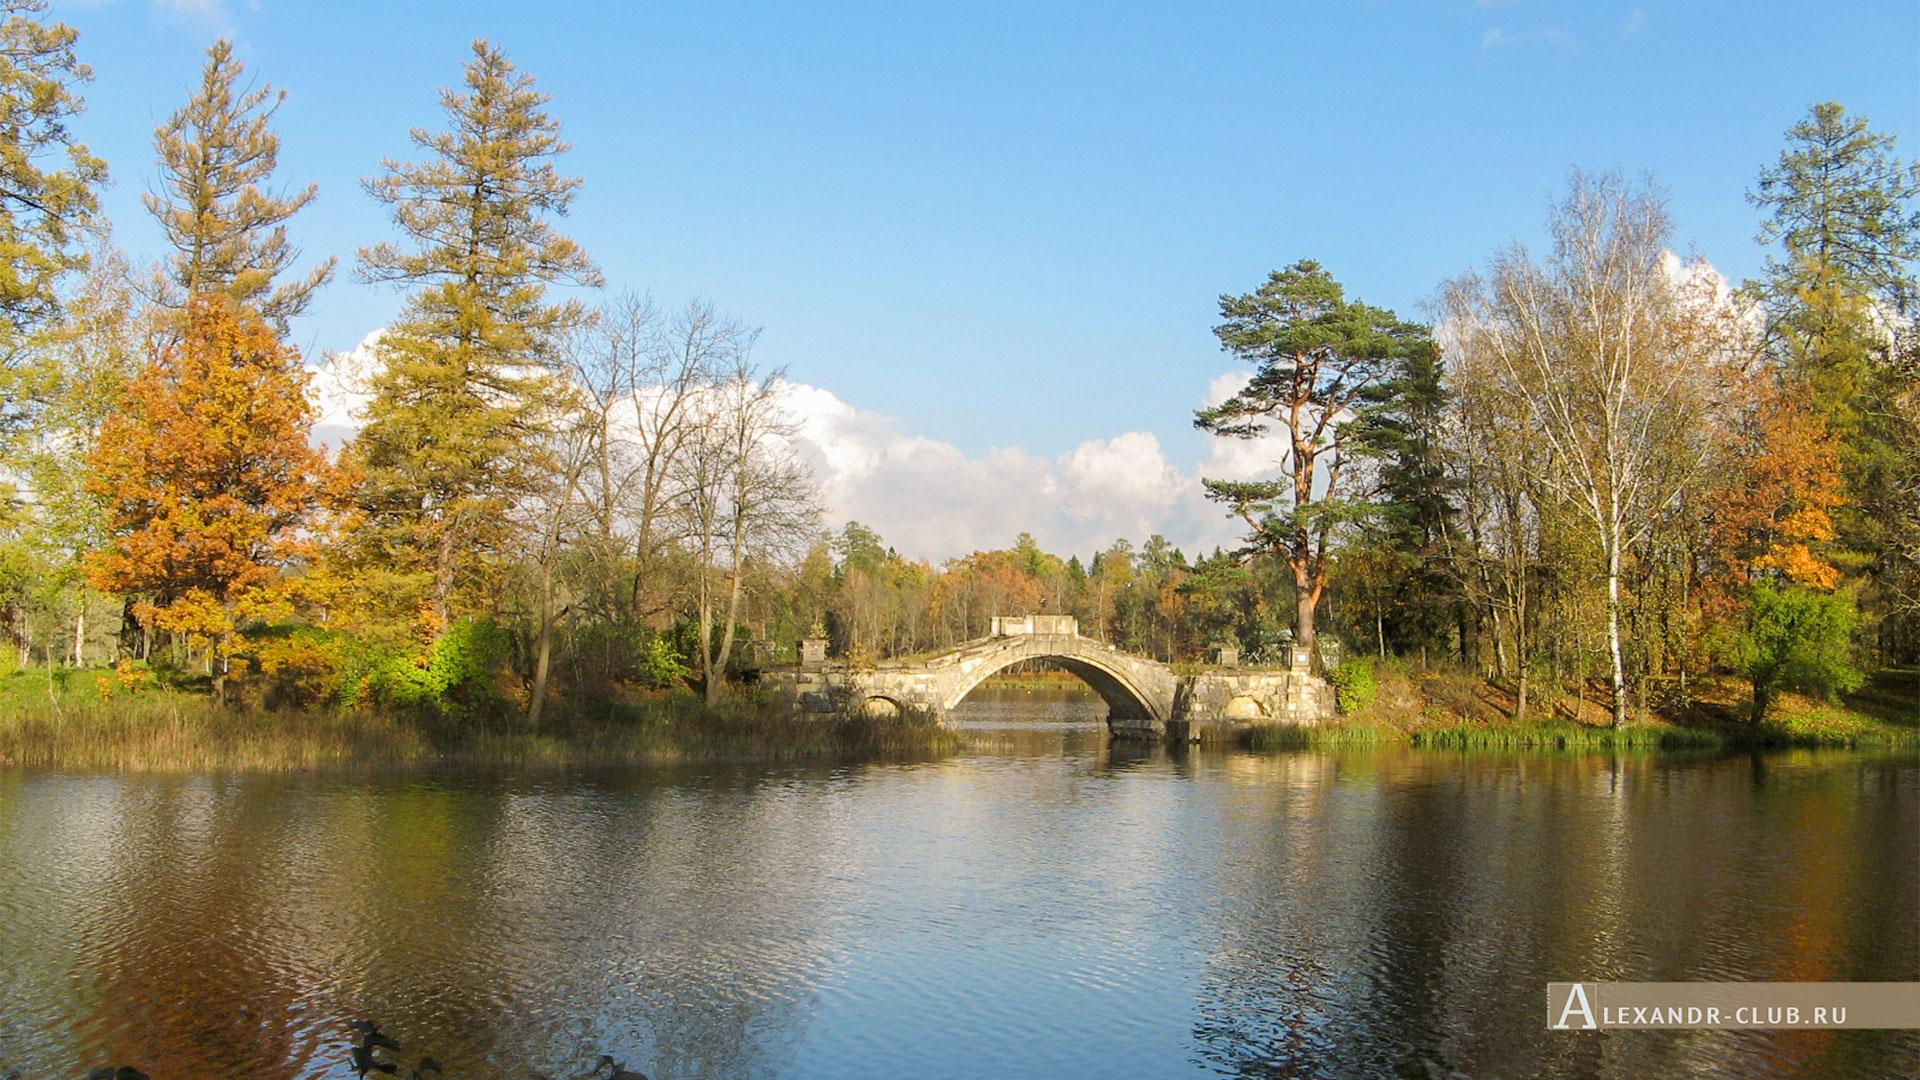 Гатчина, Гатчинский парк, осень, Горбатый мост